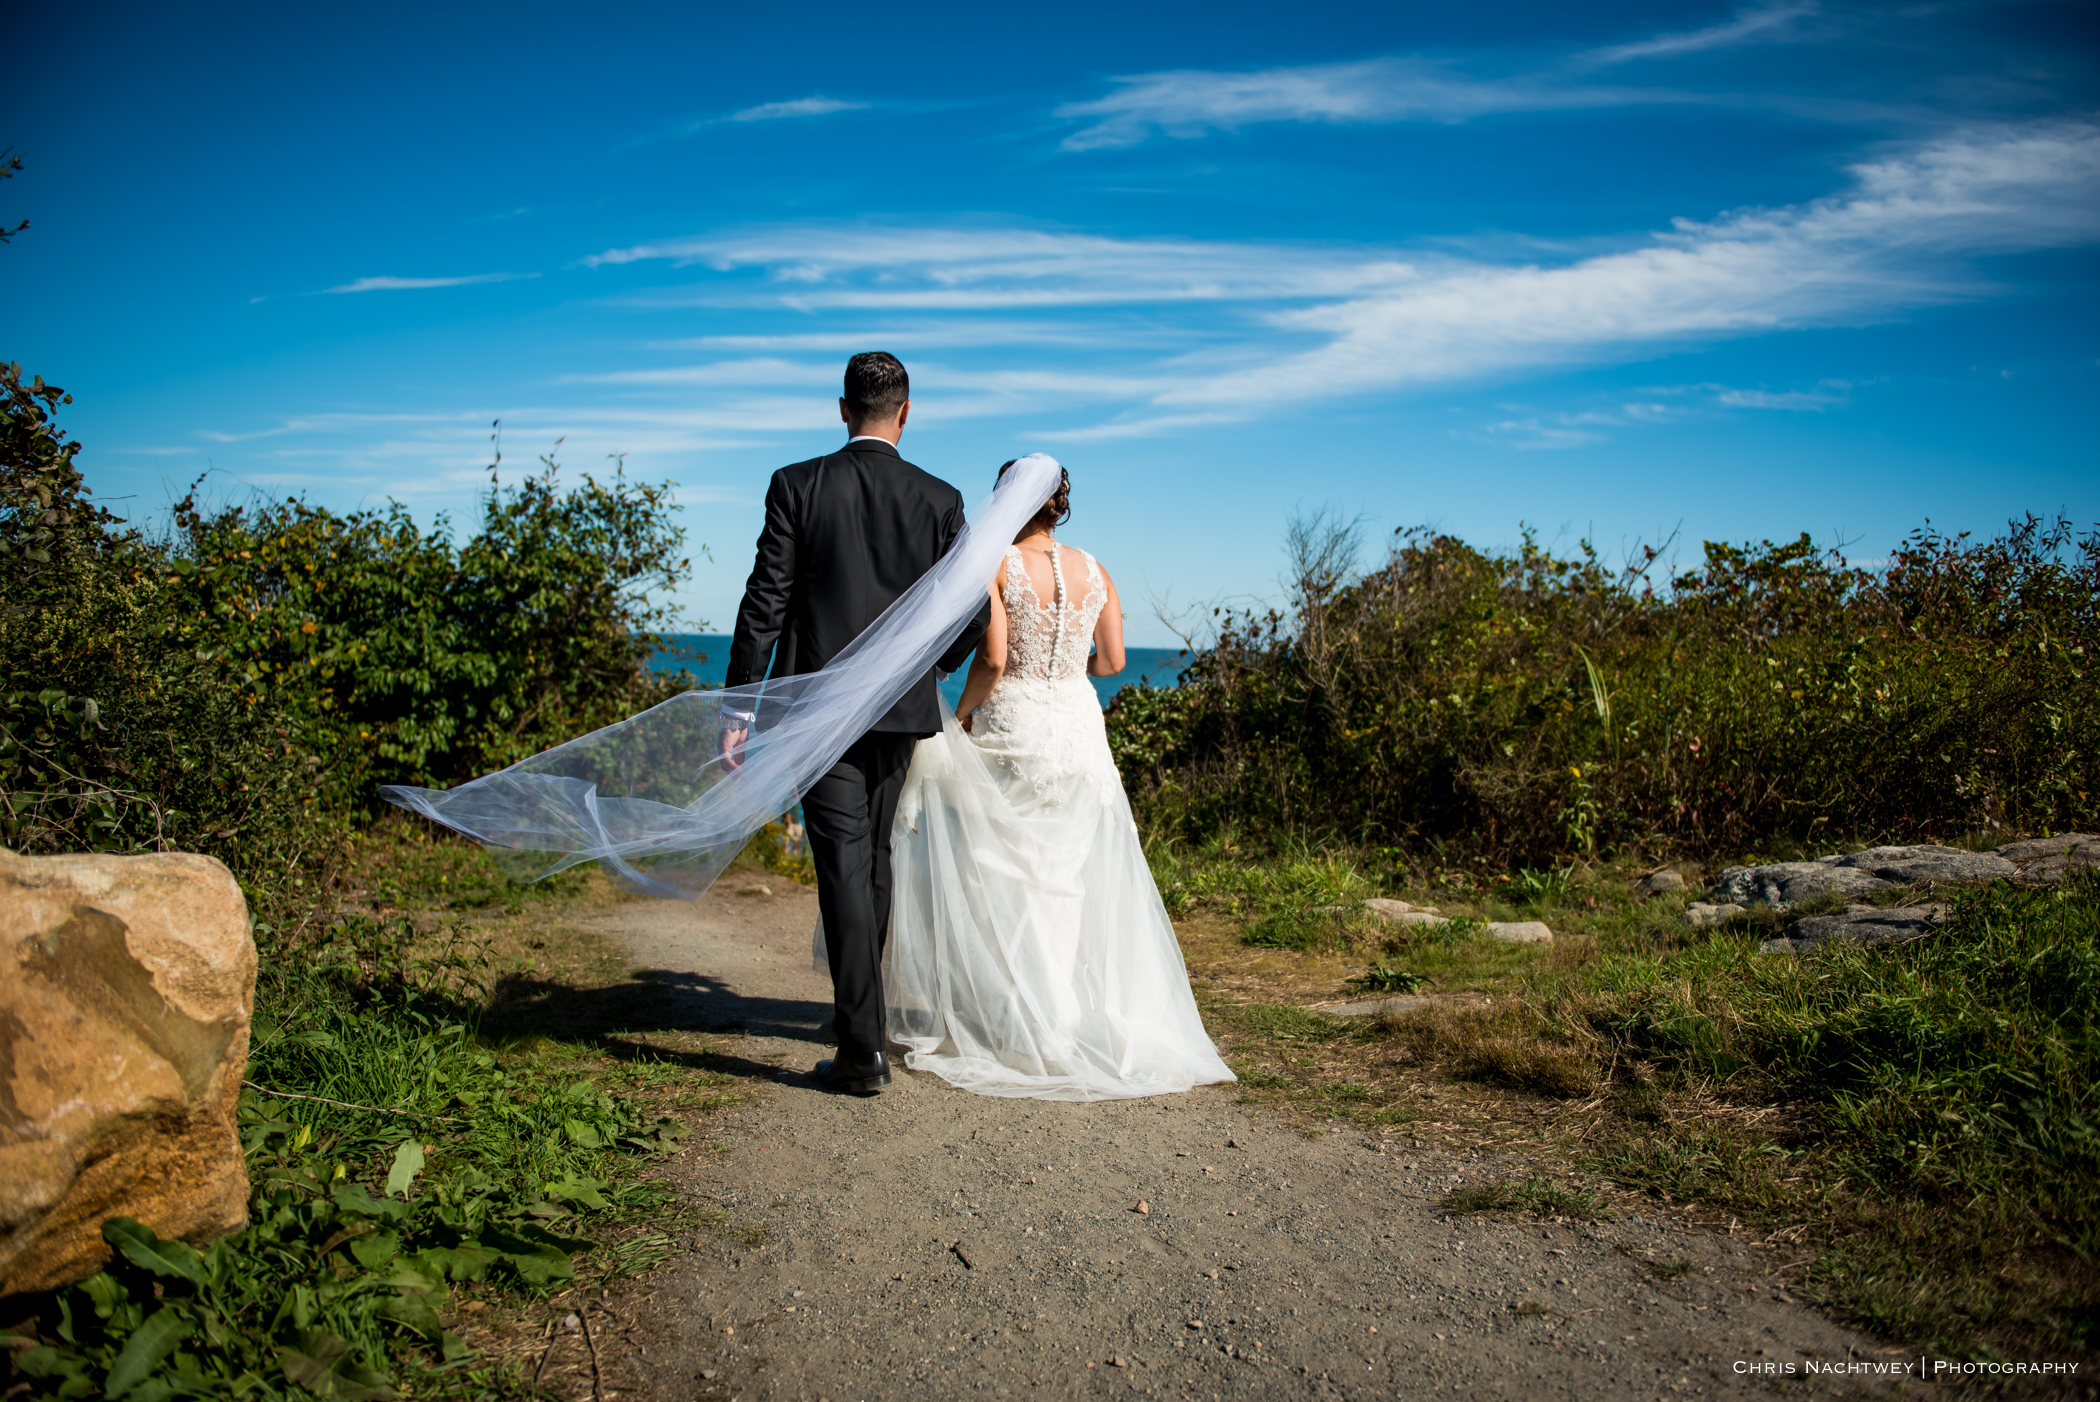 rhode-island-artistic-wedding-photographers-chris-nachtwey.jpg